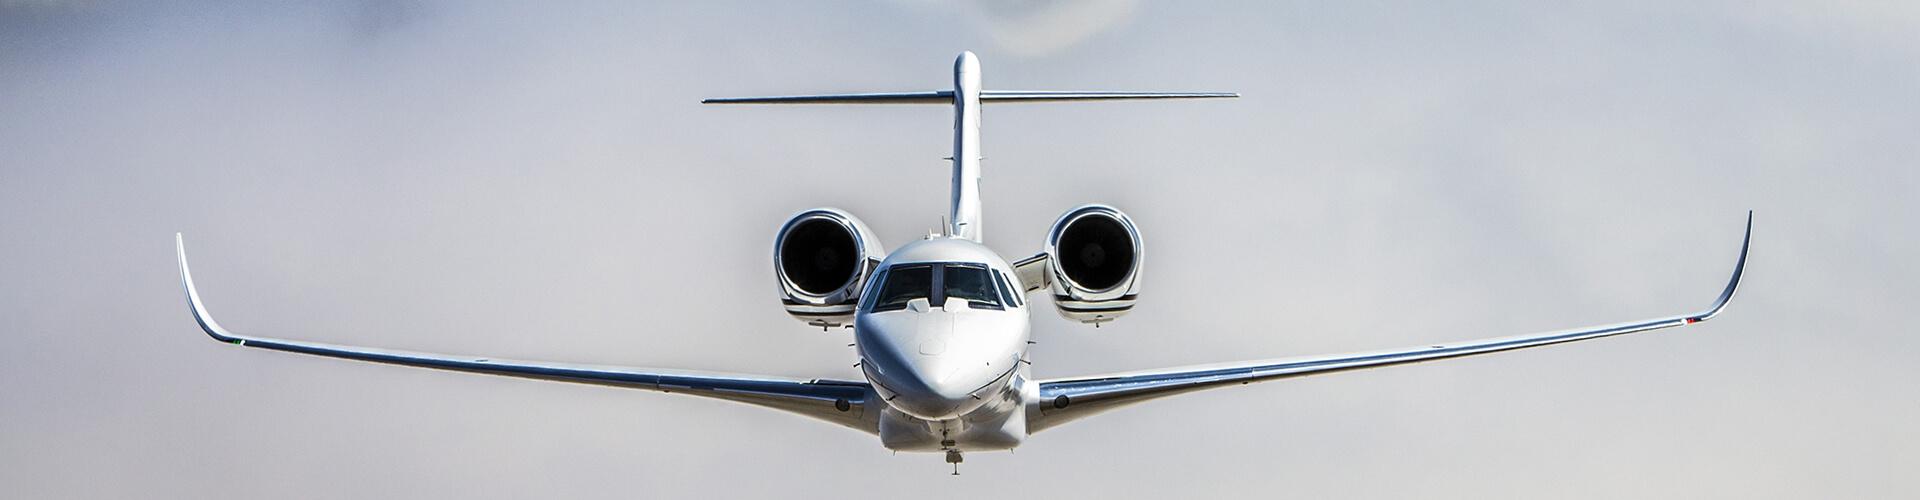 cessna-citation-excel-plane-imperial-air